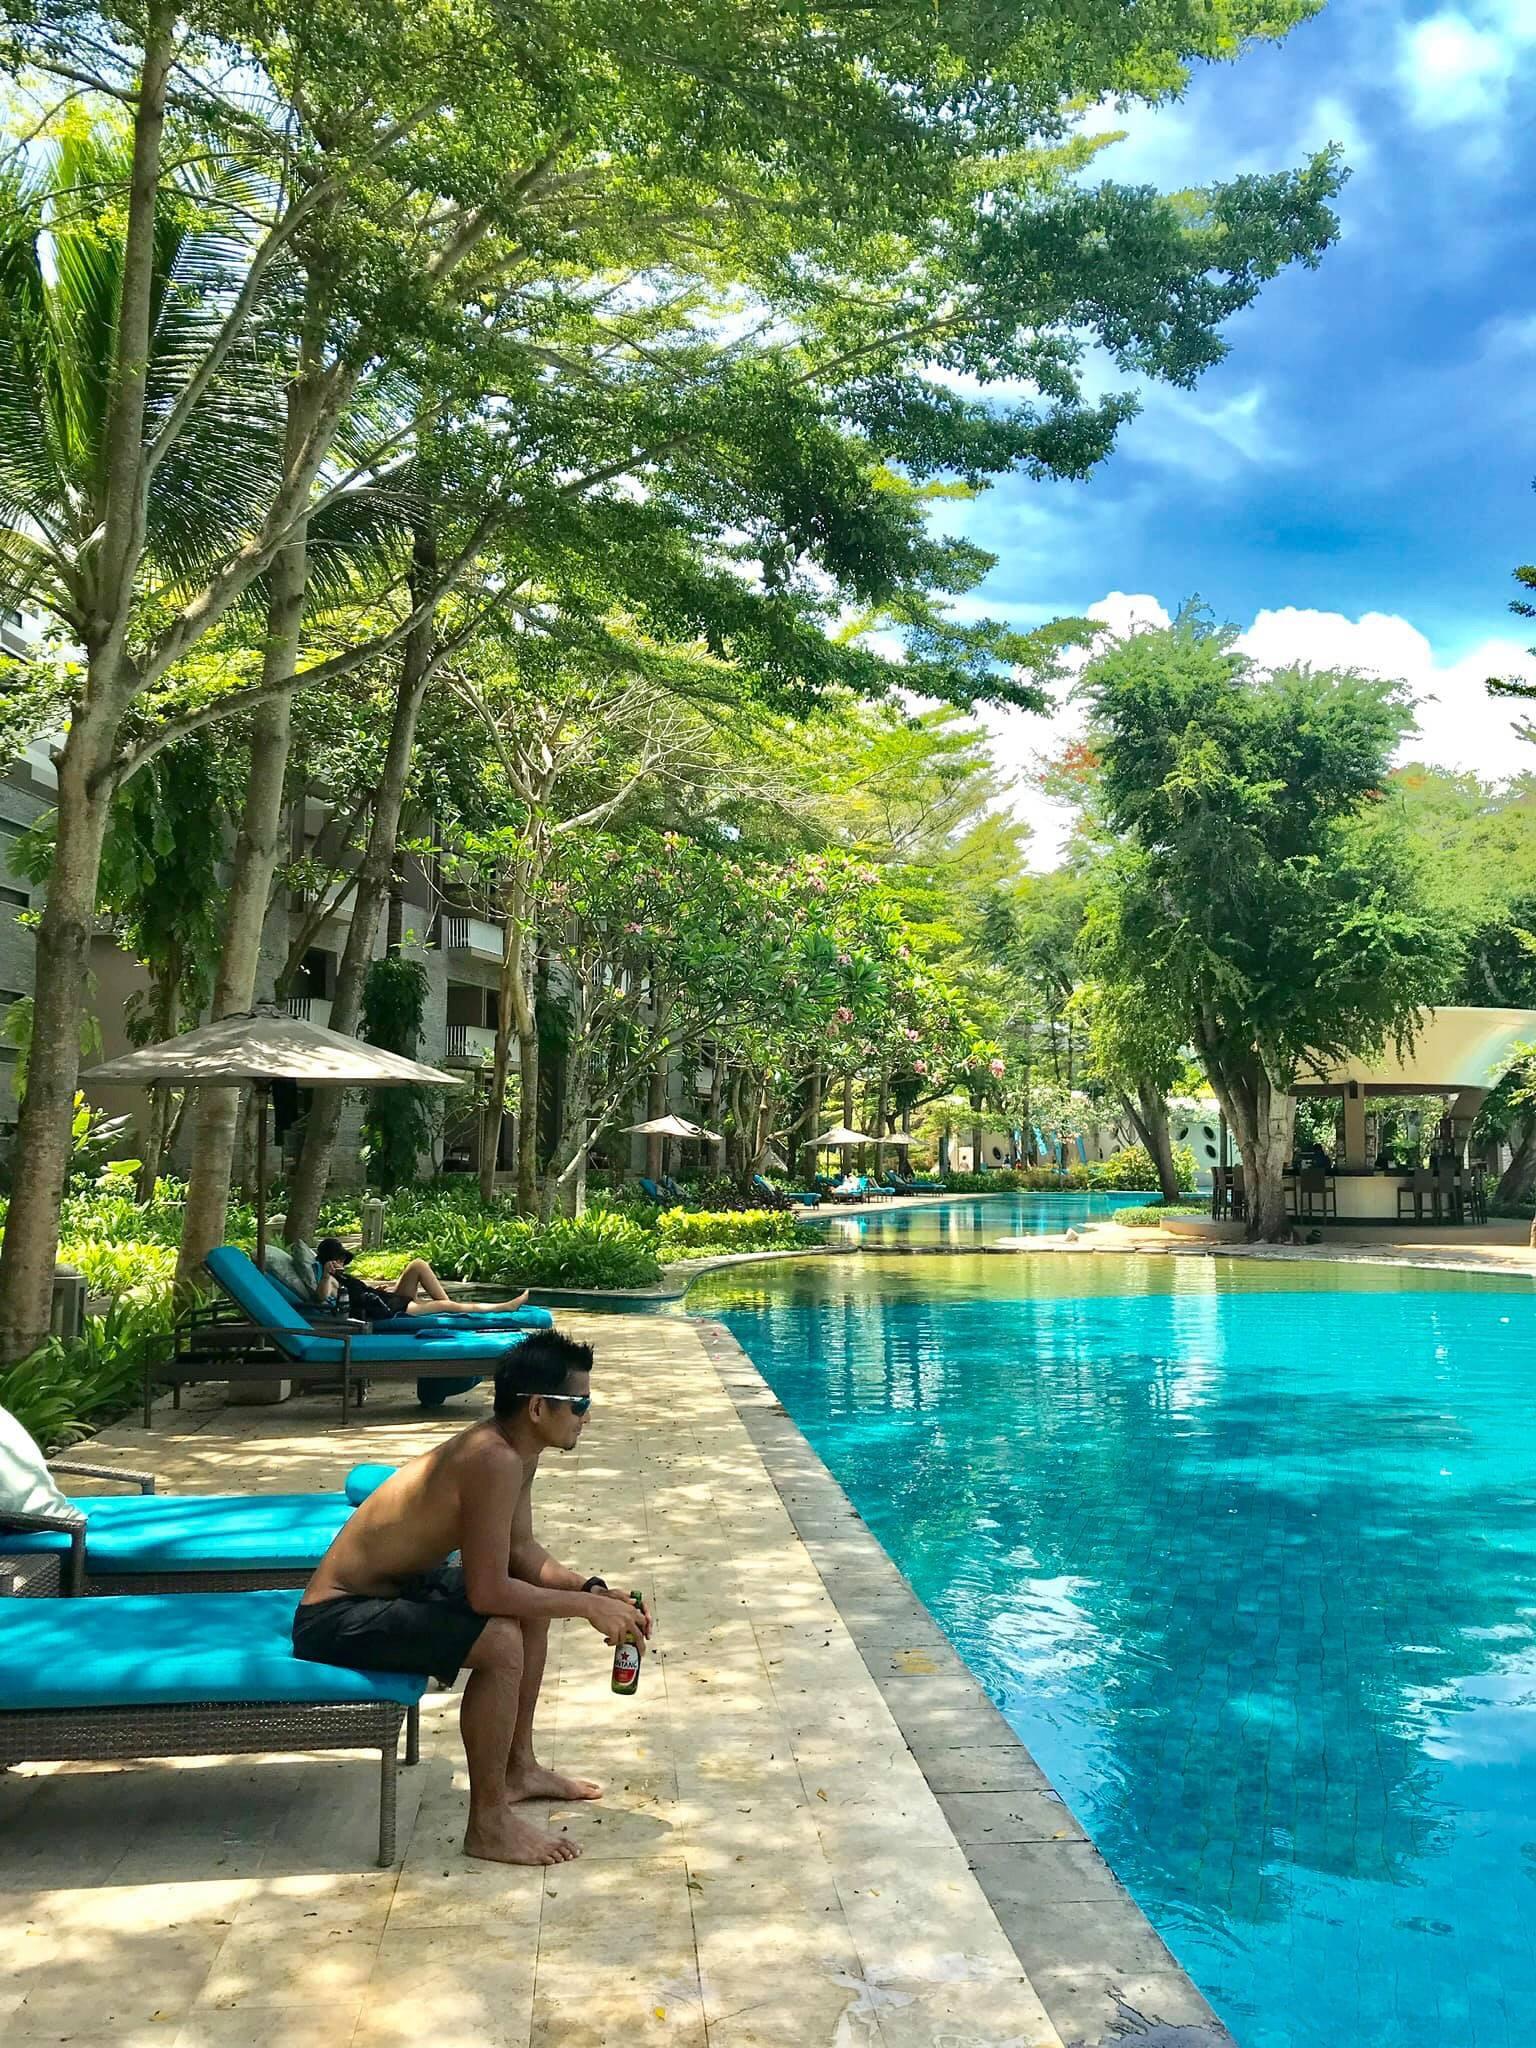 4d3n In Bali Nusa Dua Life Twogether